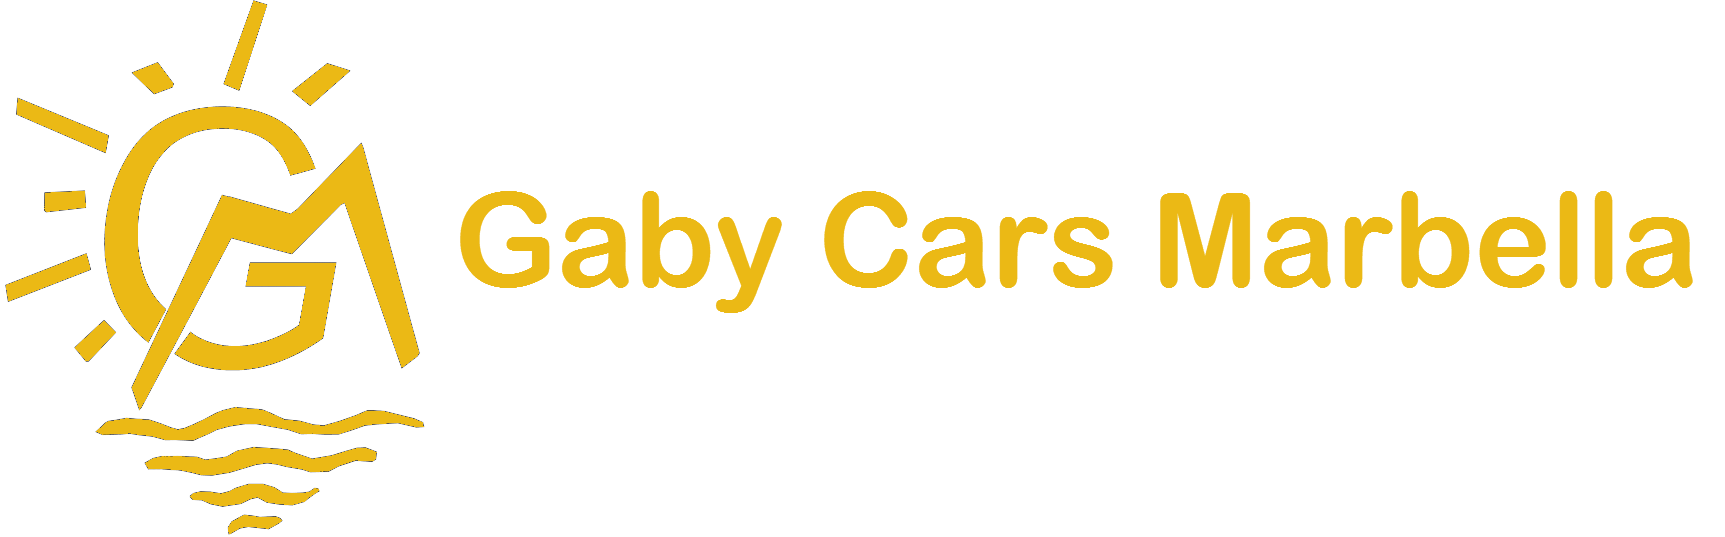 Gaby Cars Marbella